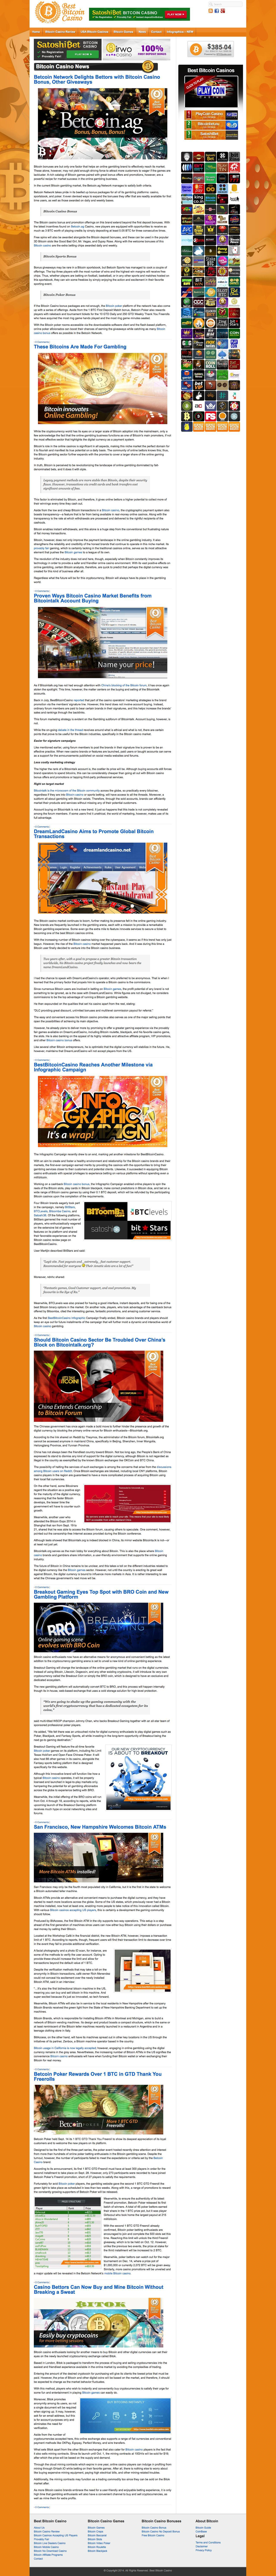 Screenshot of bestbitcoincasino.com - Bitcoin Casino News - captured Sept. 30, 2014